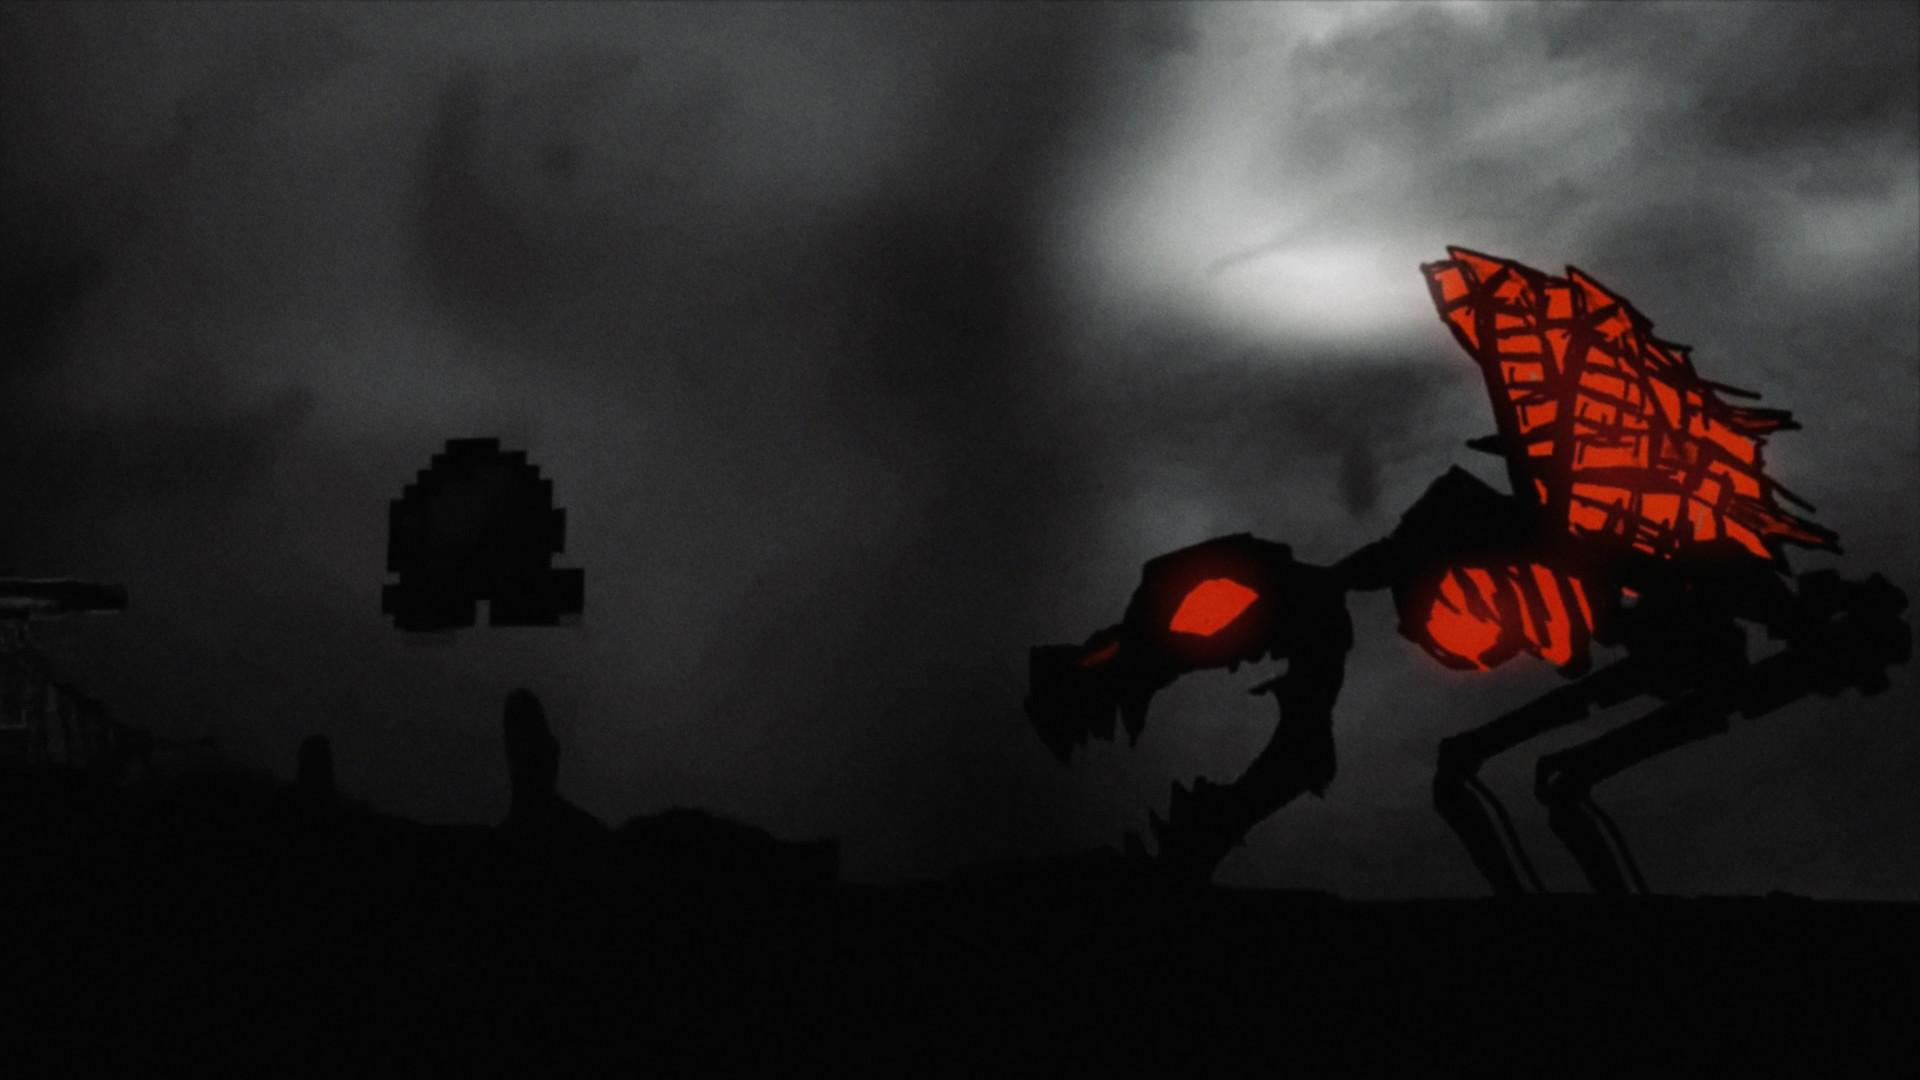 Dorian rodriguez animacion oldyssey ganador bronce proyecto multimedia 11 00 01 12 16 still011